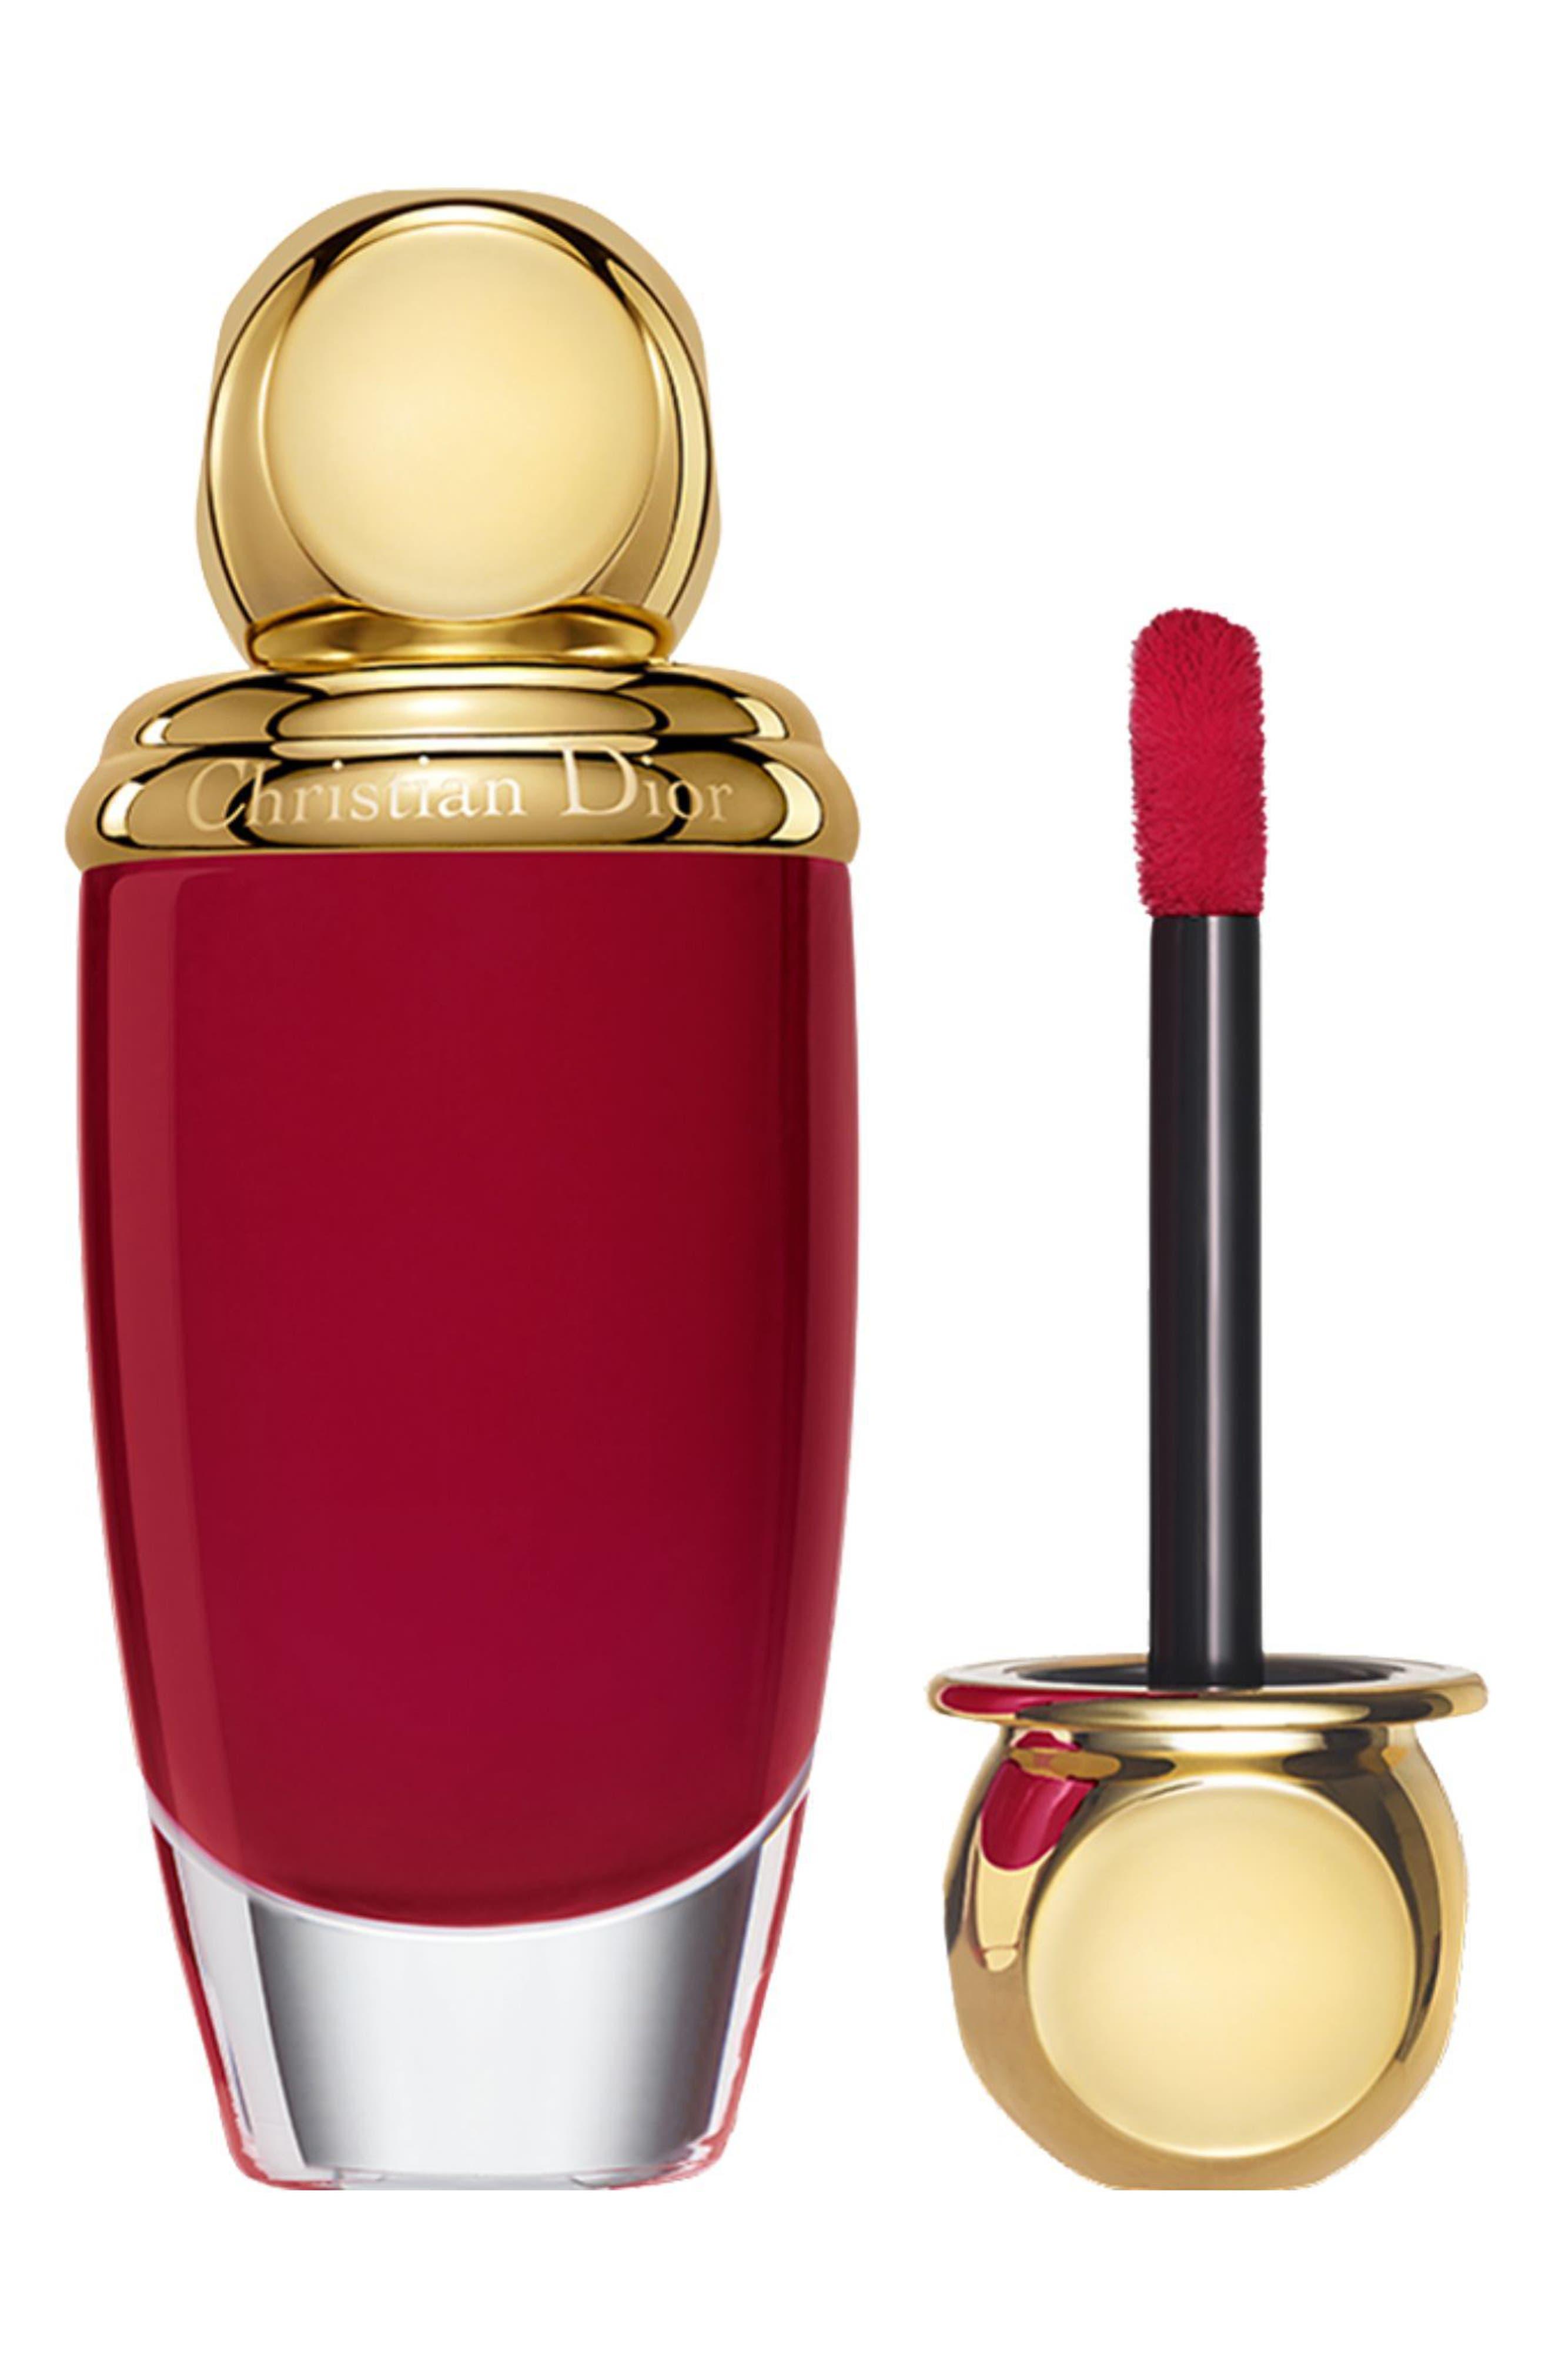 Dior Diorific Matte Fluid Lip & Cheek Velvet Colour (Limited Edition)